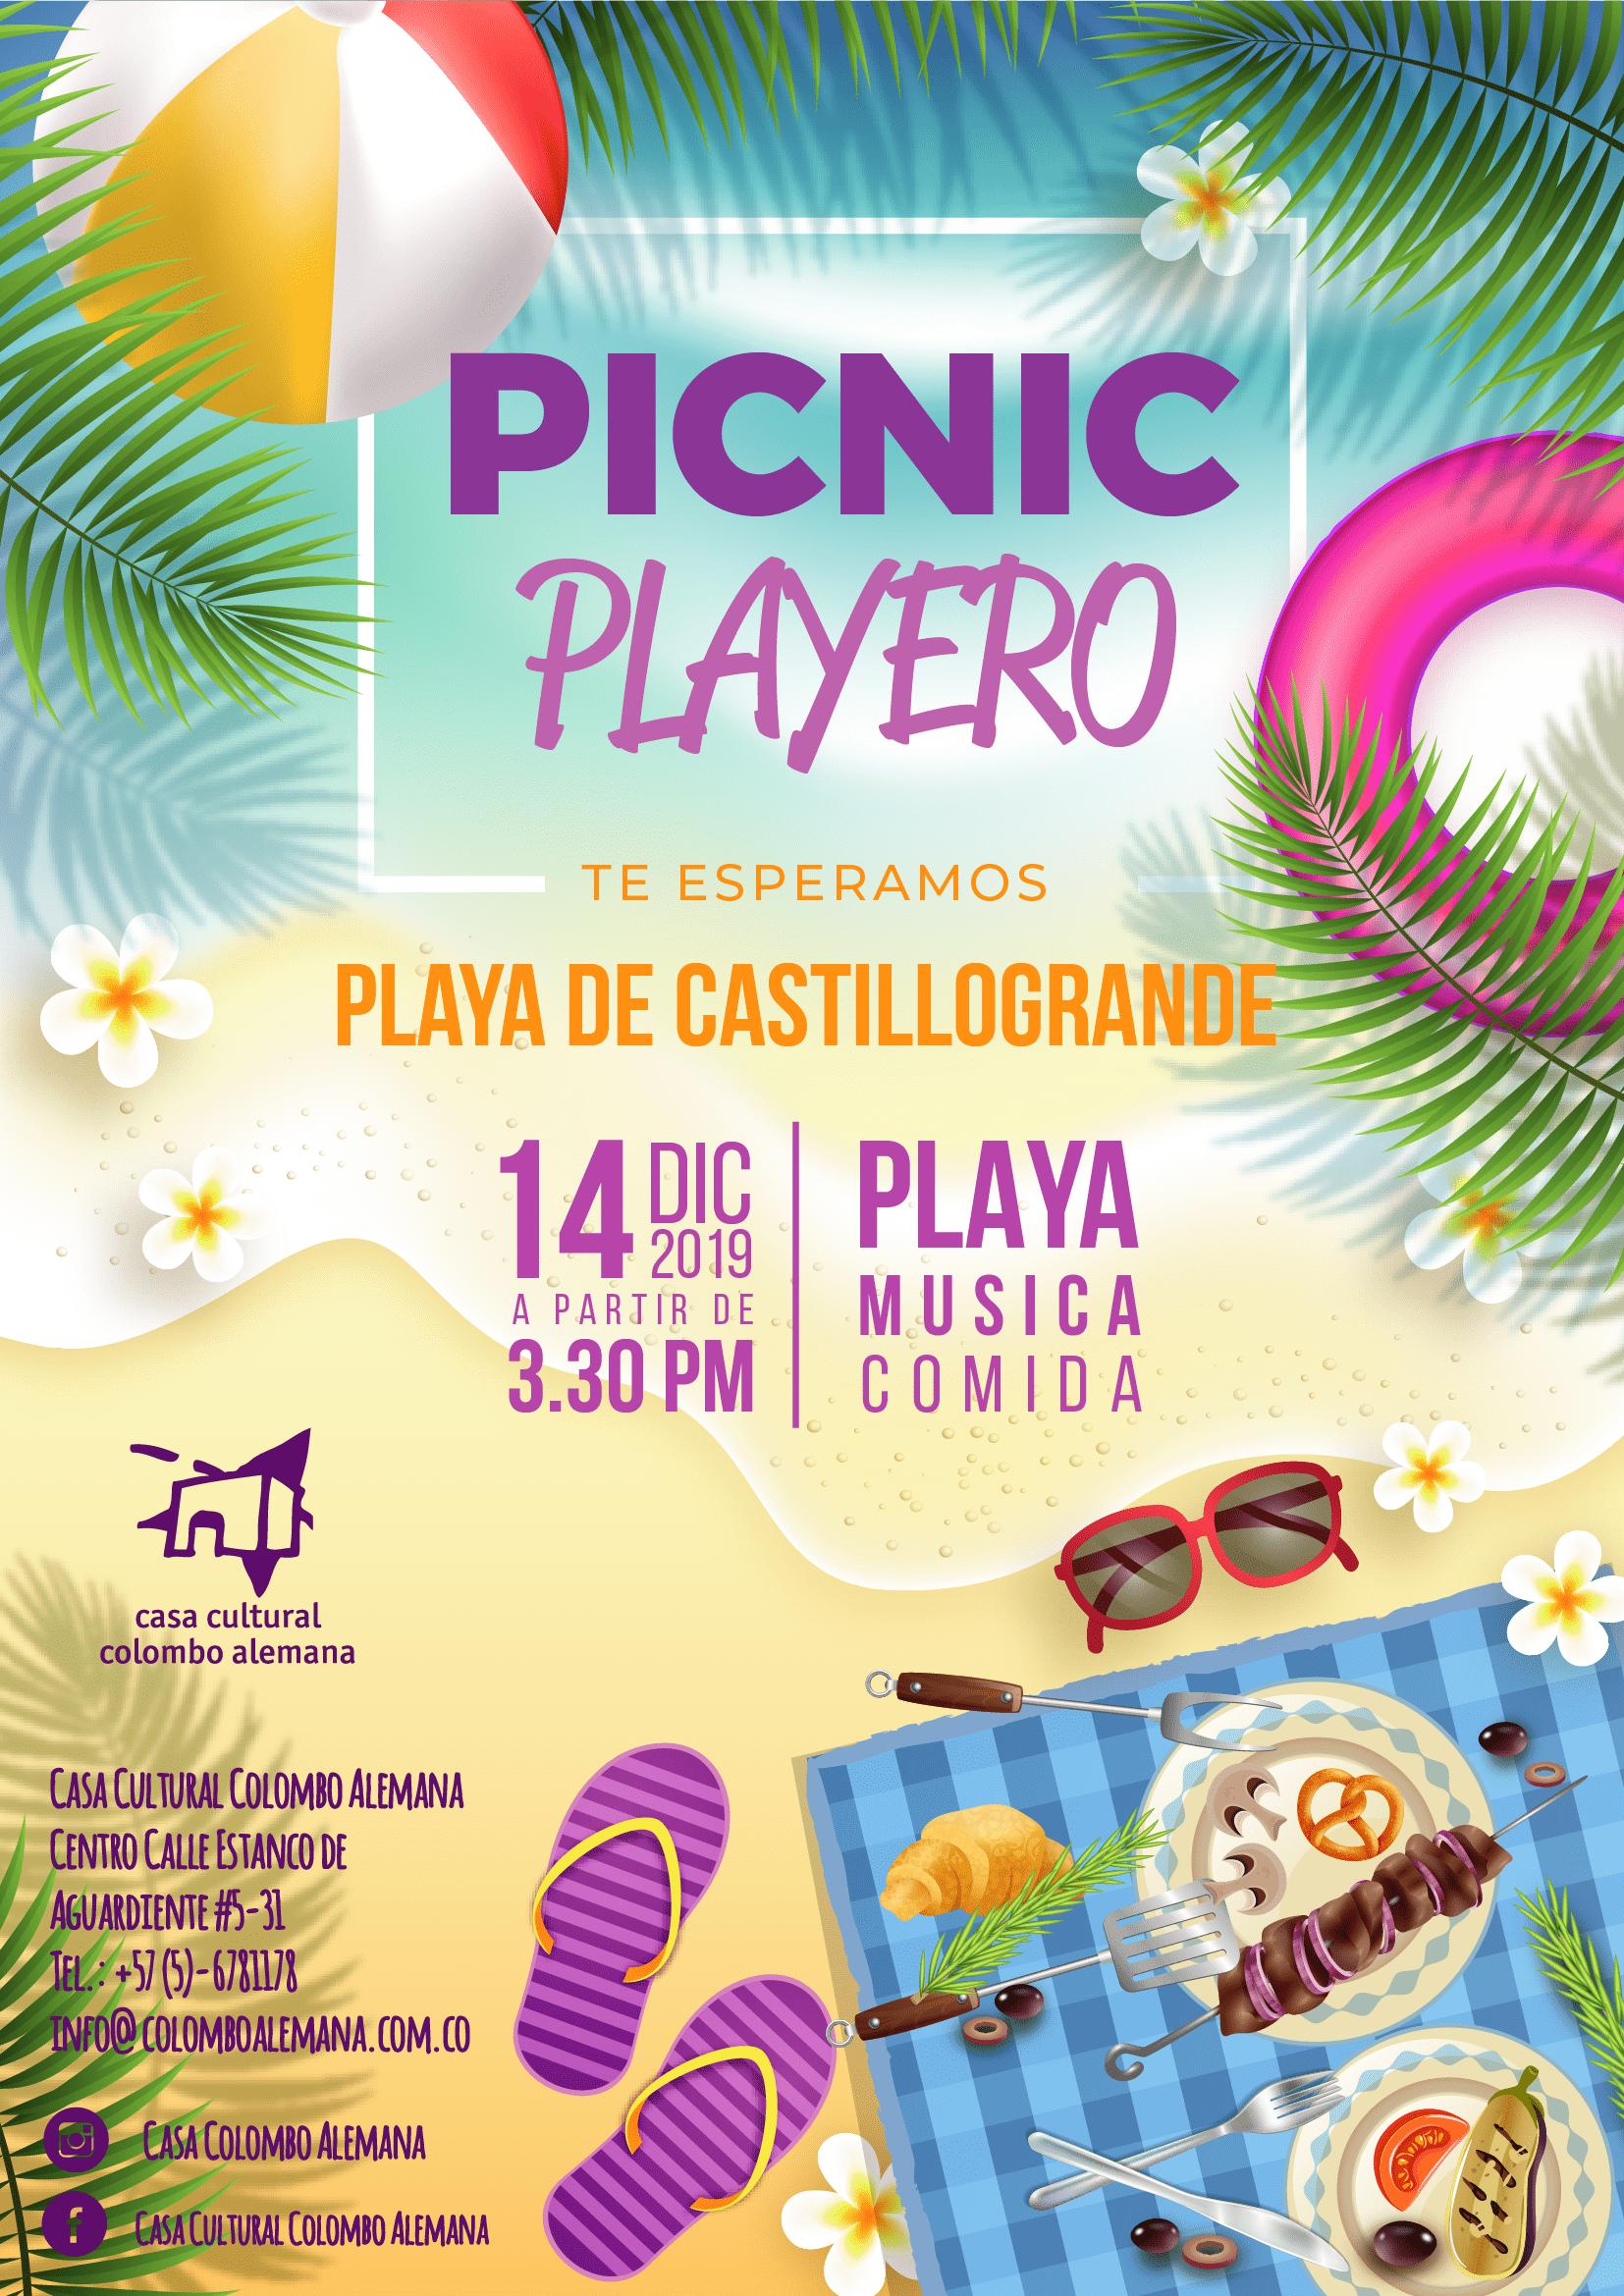 Picnic playero_dic 2019-min